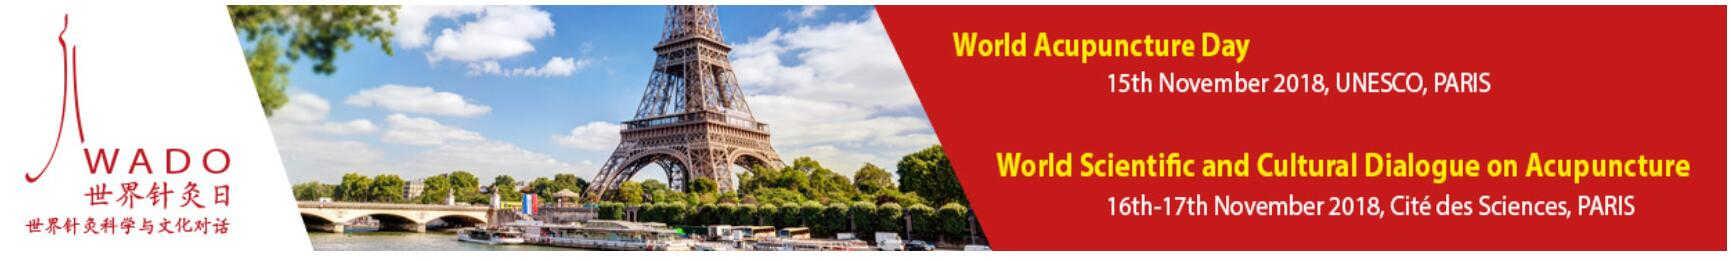 Word Acupuncture Day, Paris 2018